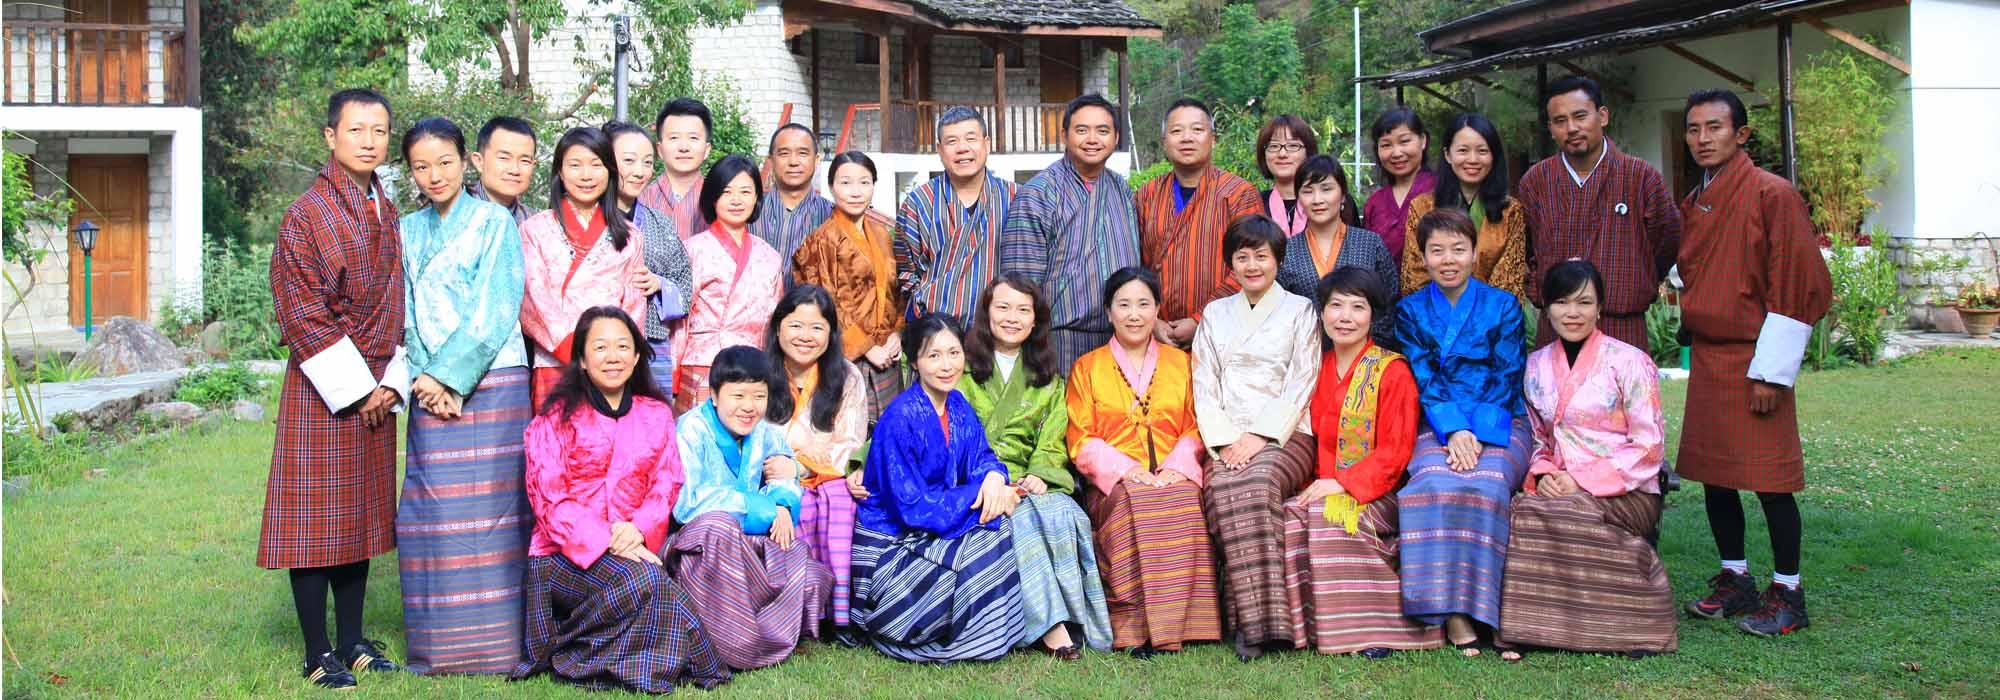 About Us Bhutan Majestic Travel Team Bhutan Tour Operator